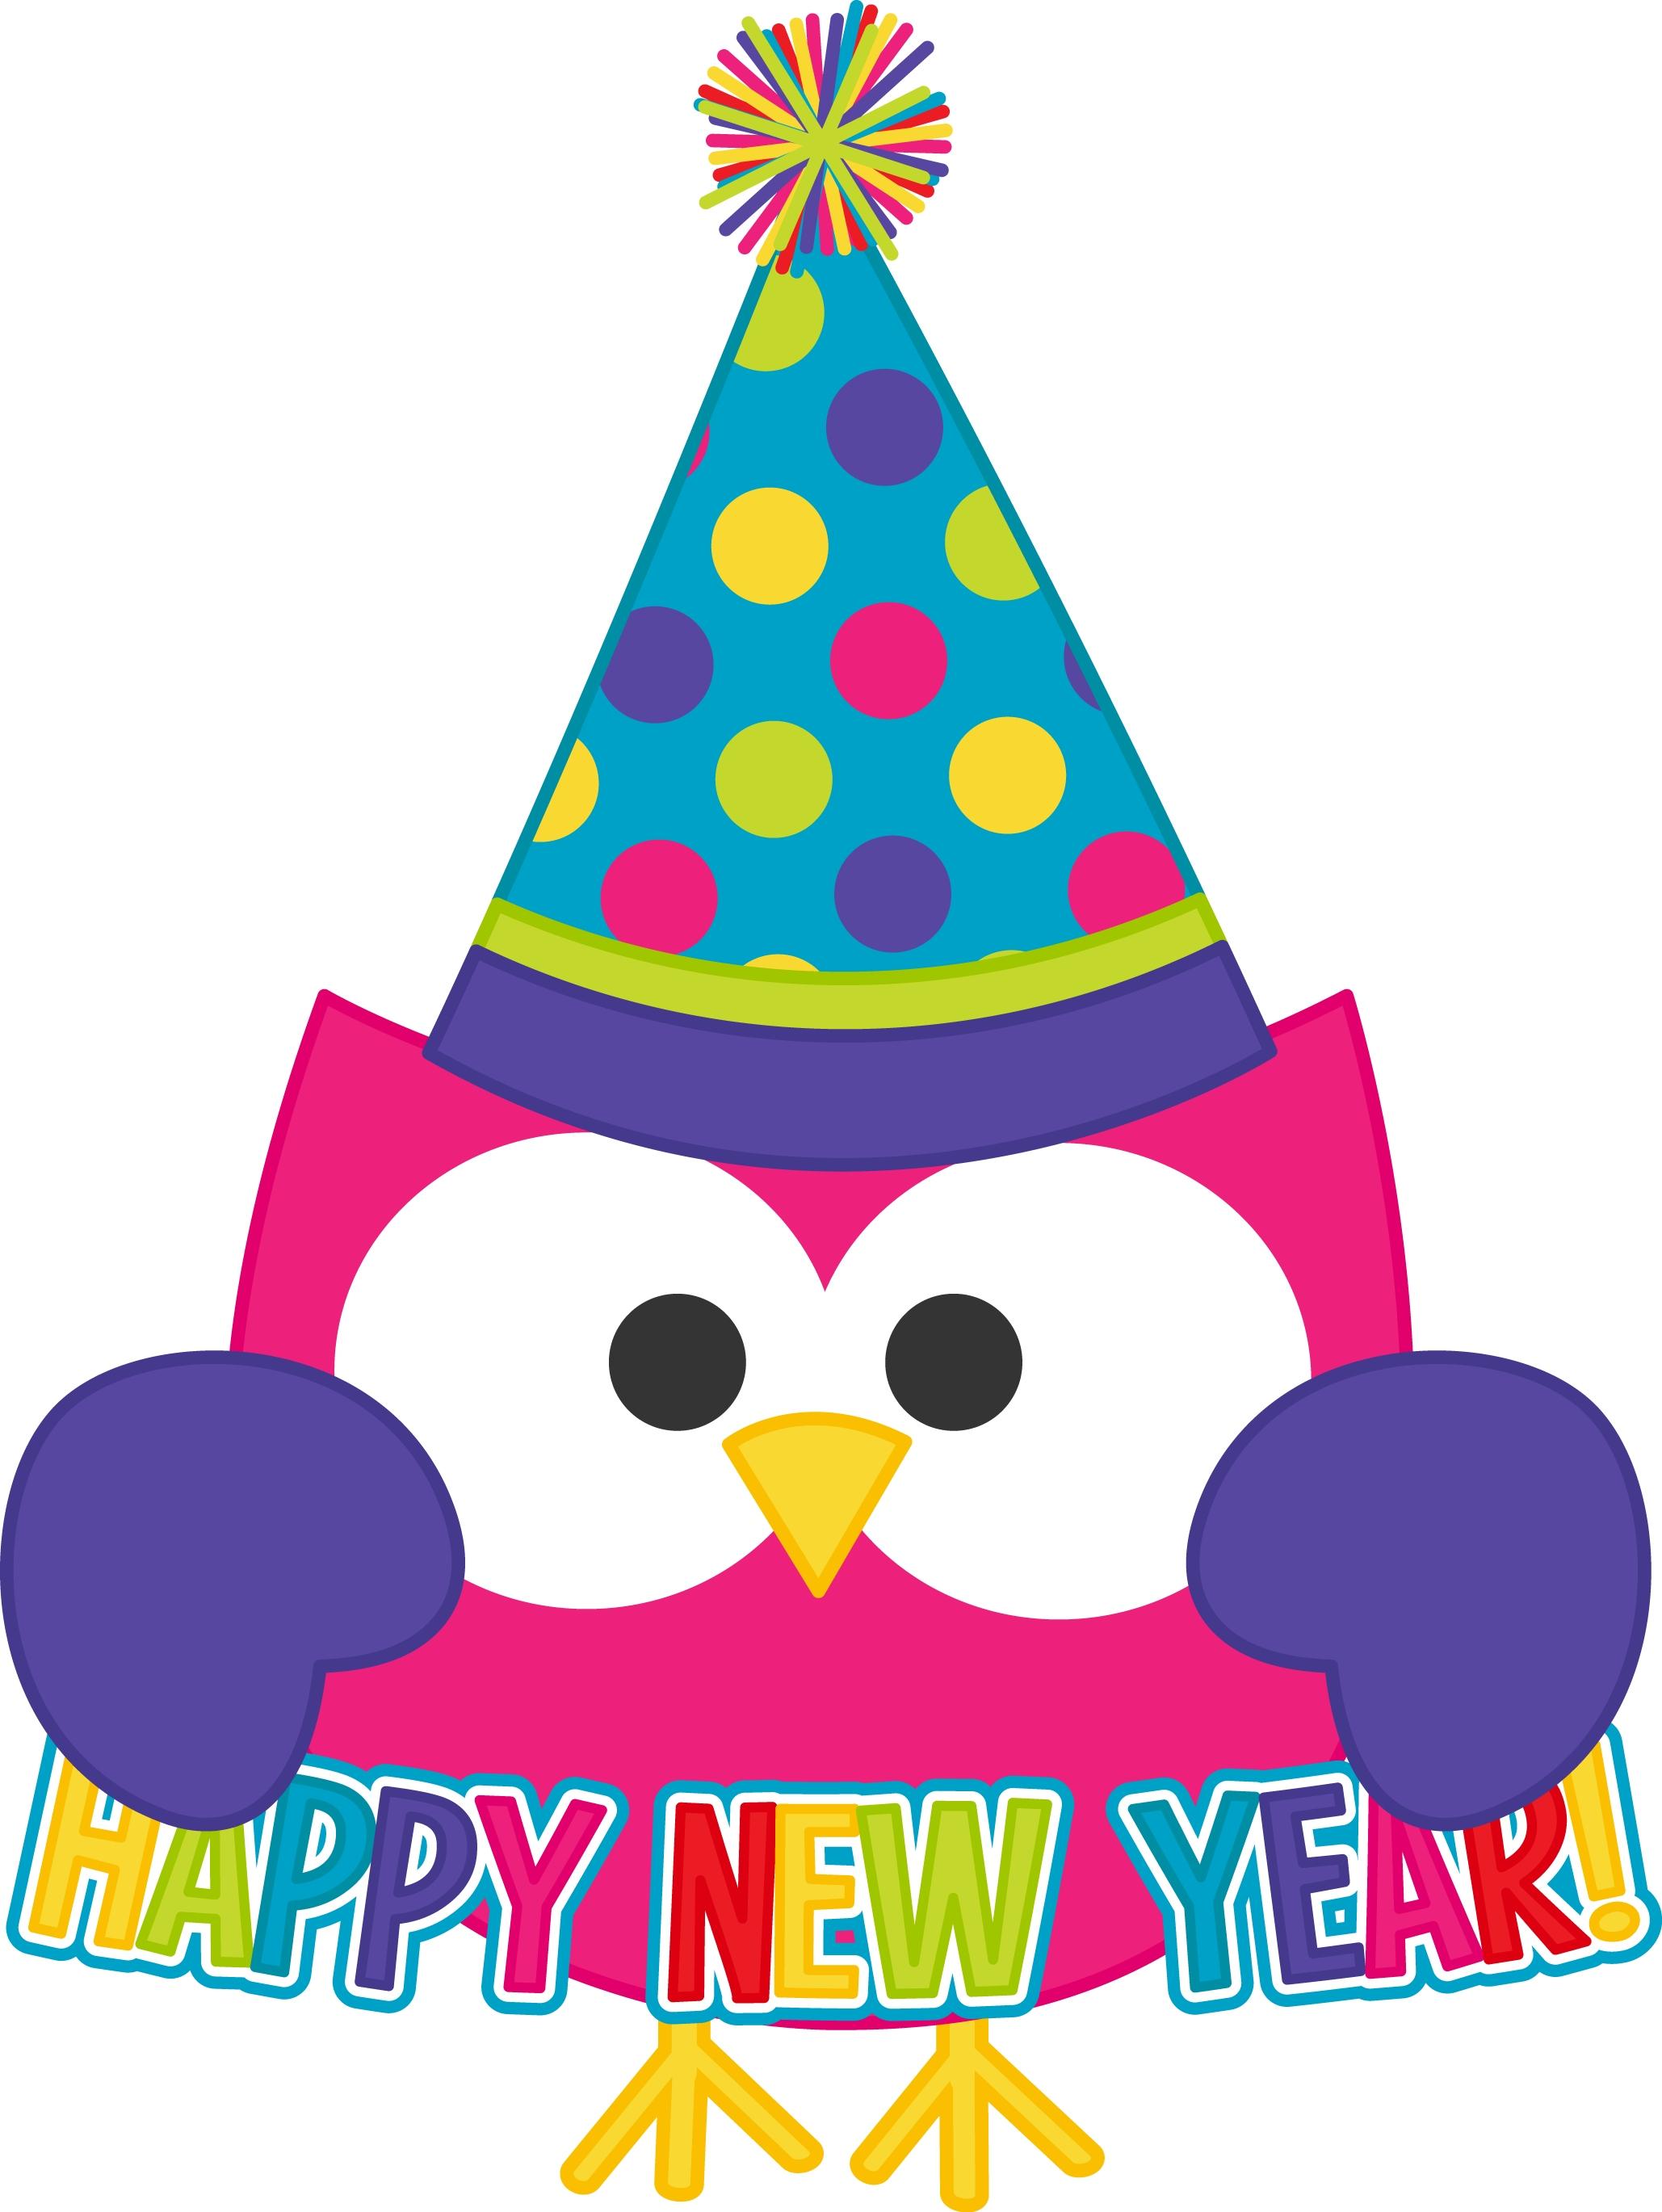 Happy New Year 2017 Free Cute .